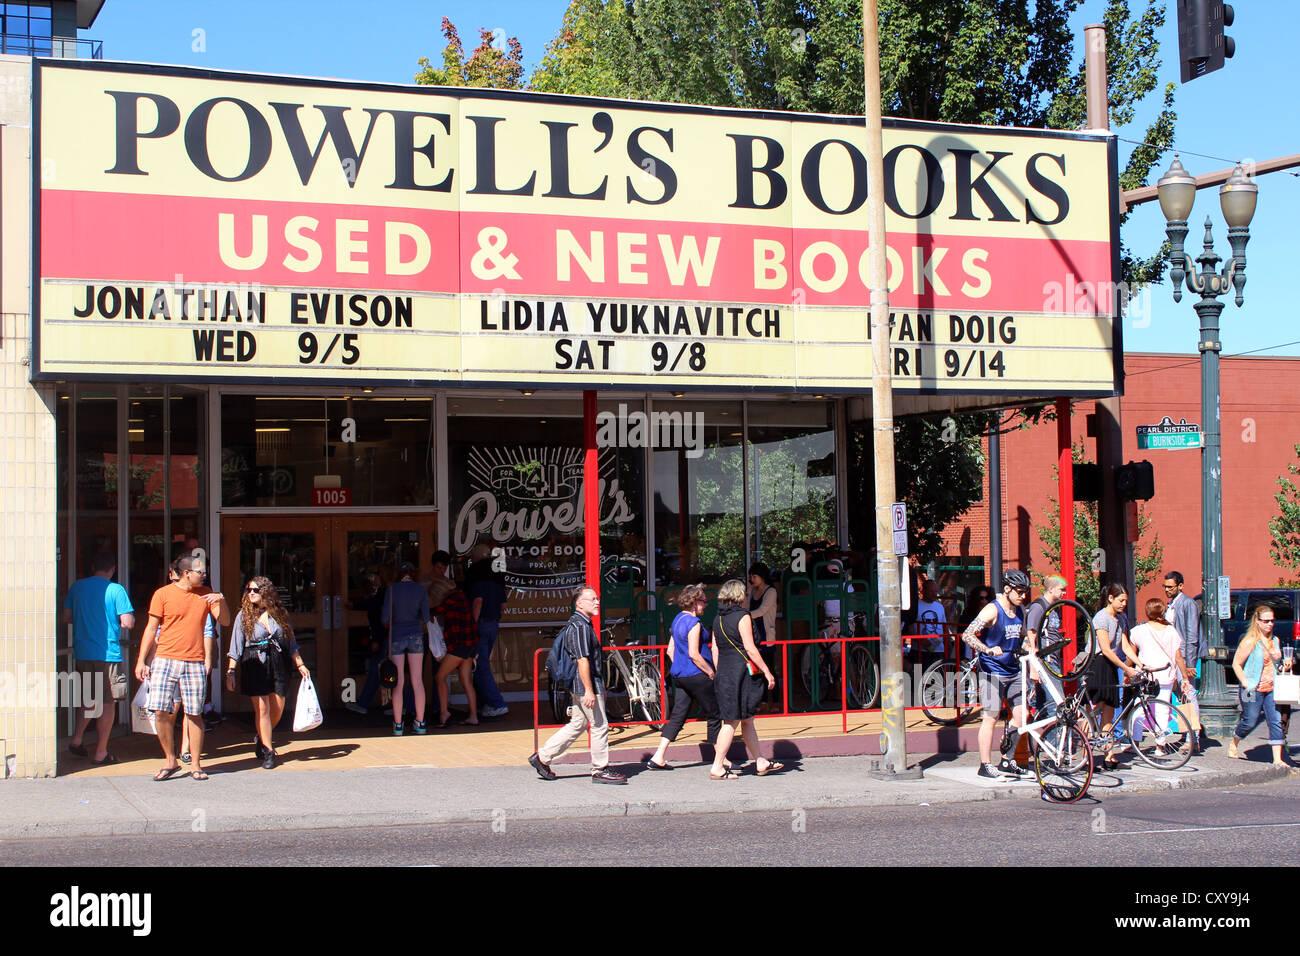 Powell's Bookstore, Portland, Oregon, USA - Stock Image